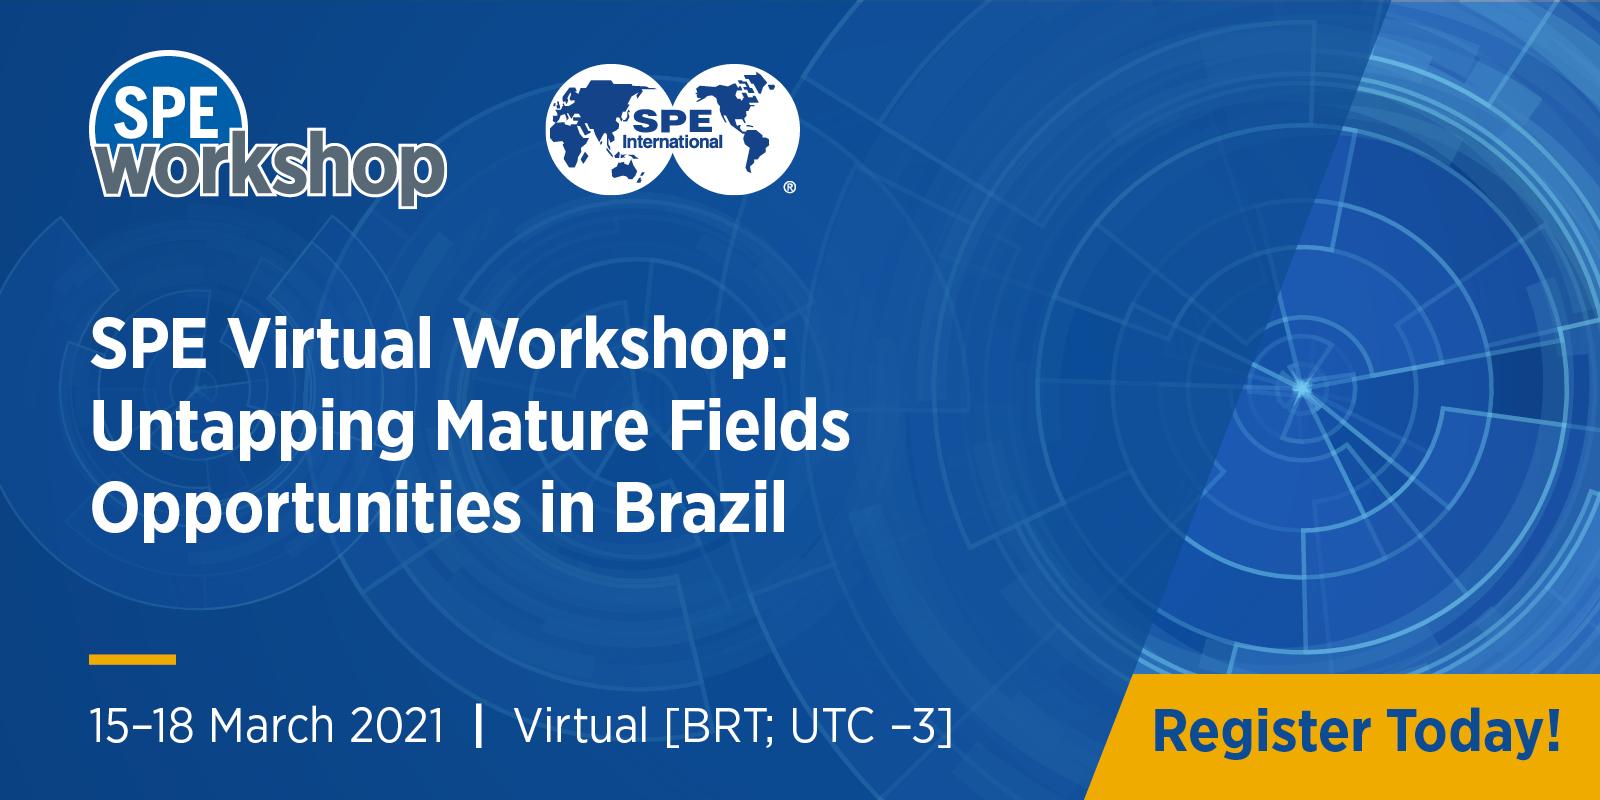 SPE Virtual Workshop: Untapping Mature Fields Opportunities in Brazil